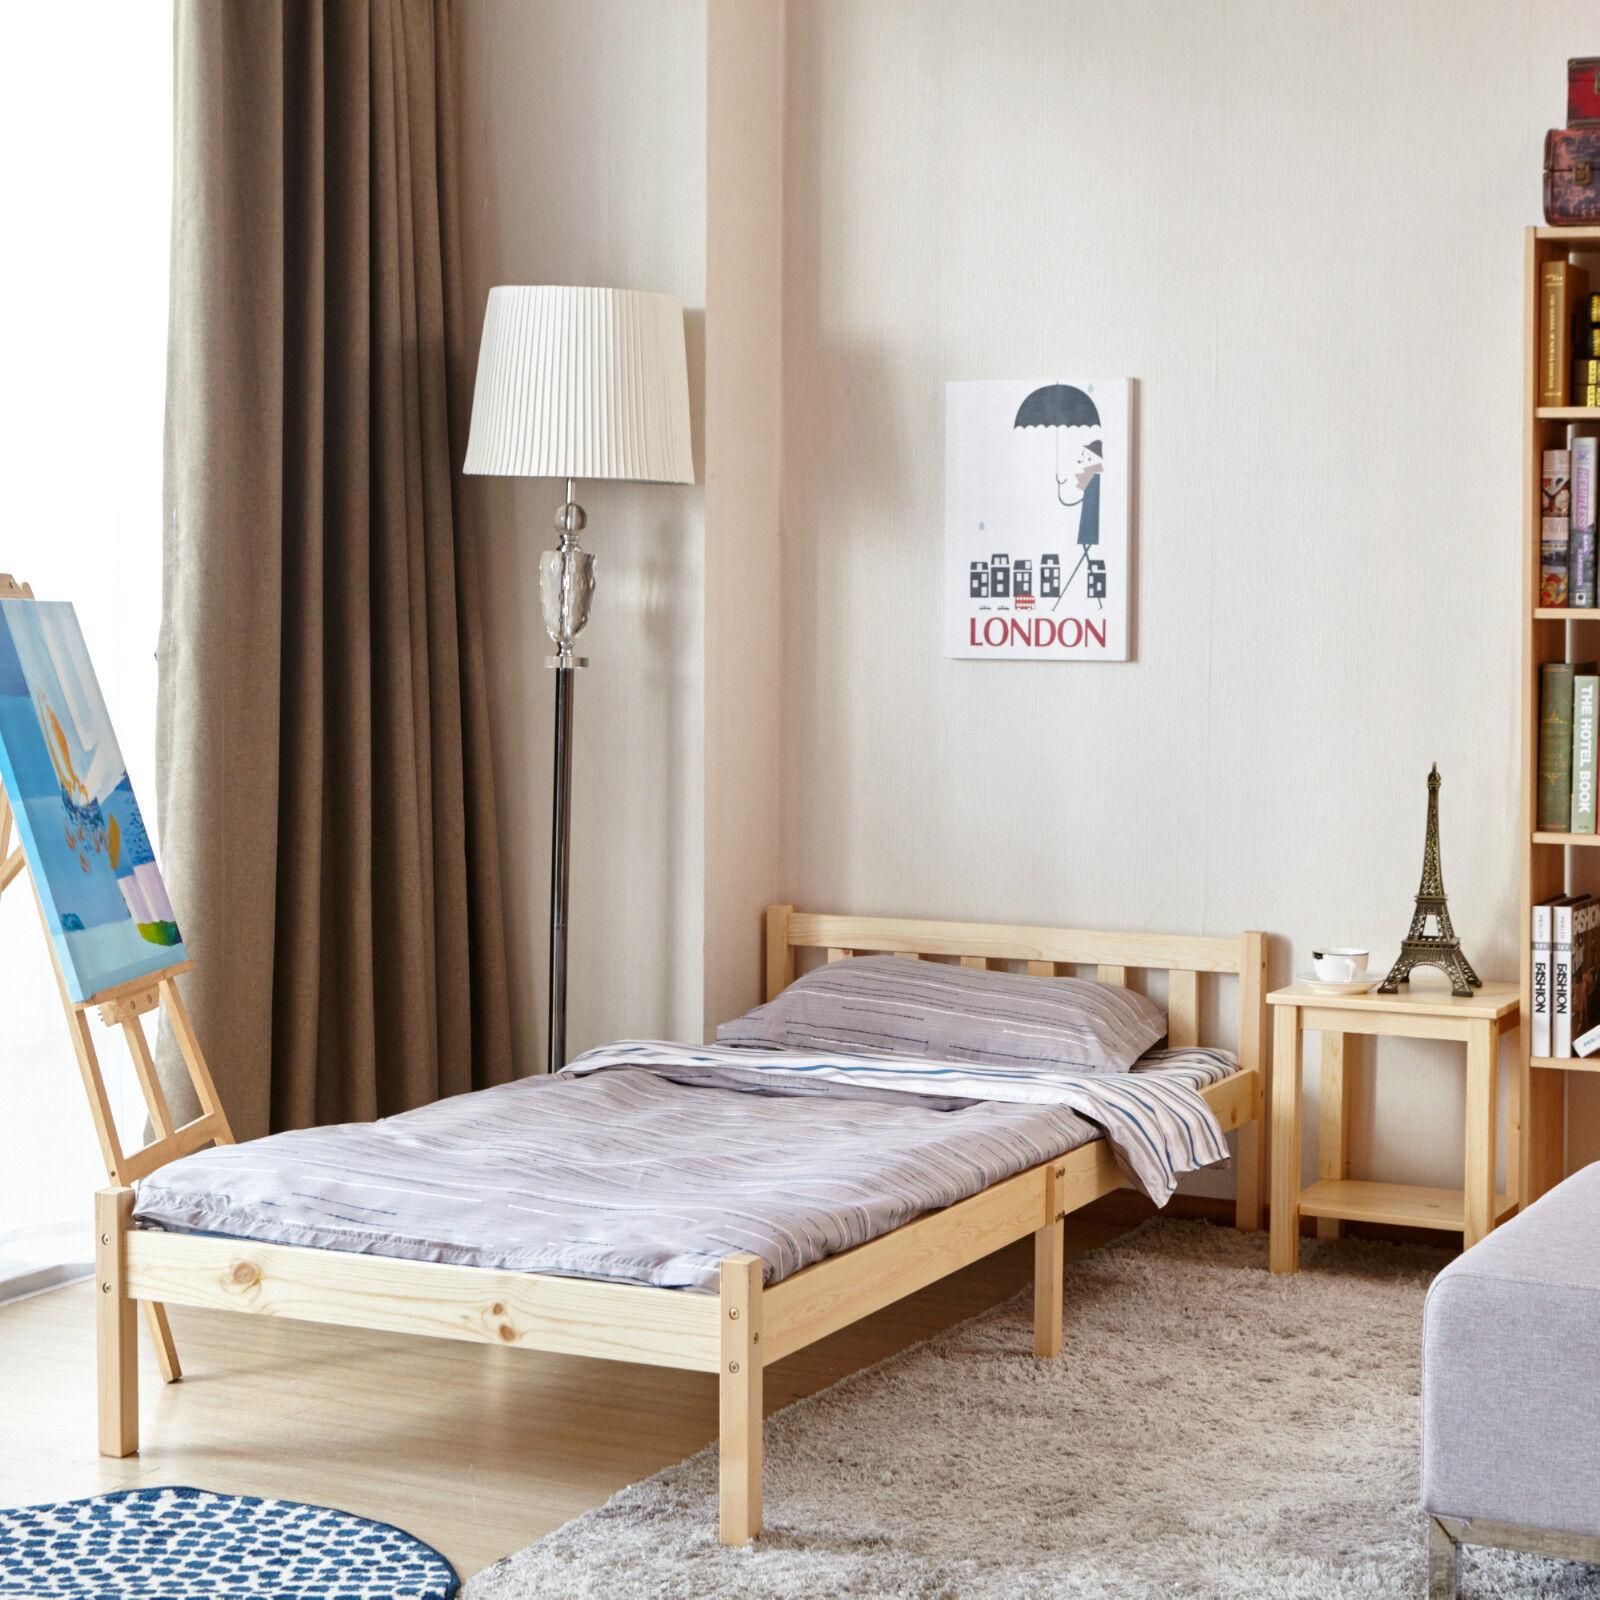 Bed Frame 3FT Solid Pine Natural Wooden Beds Single Wood for Adult ...